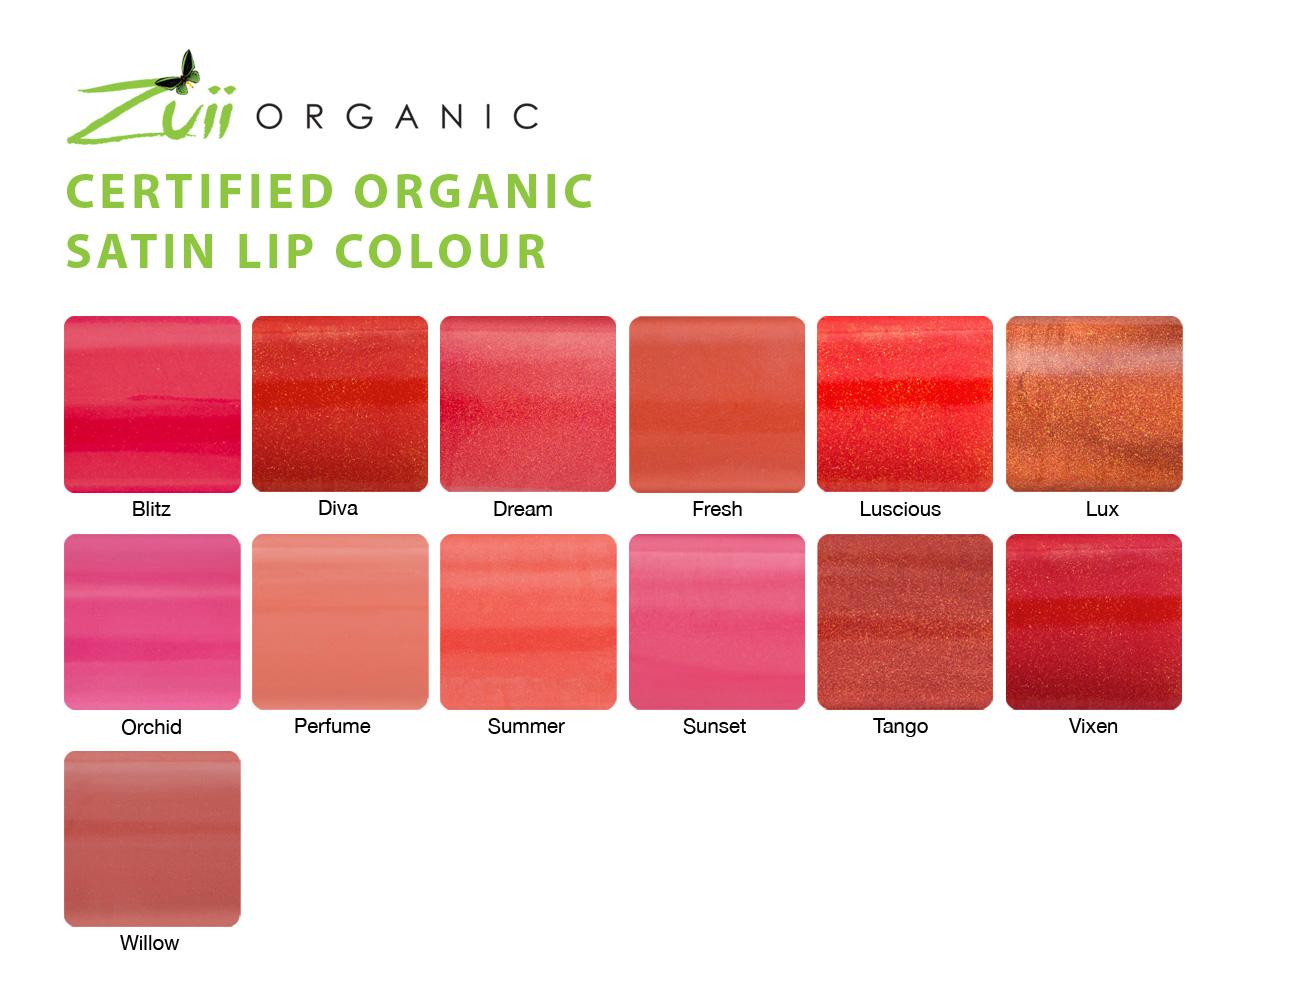 zuii organic satin lipcolour